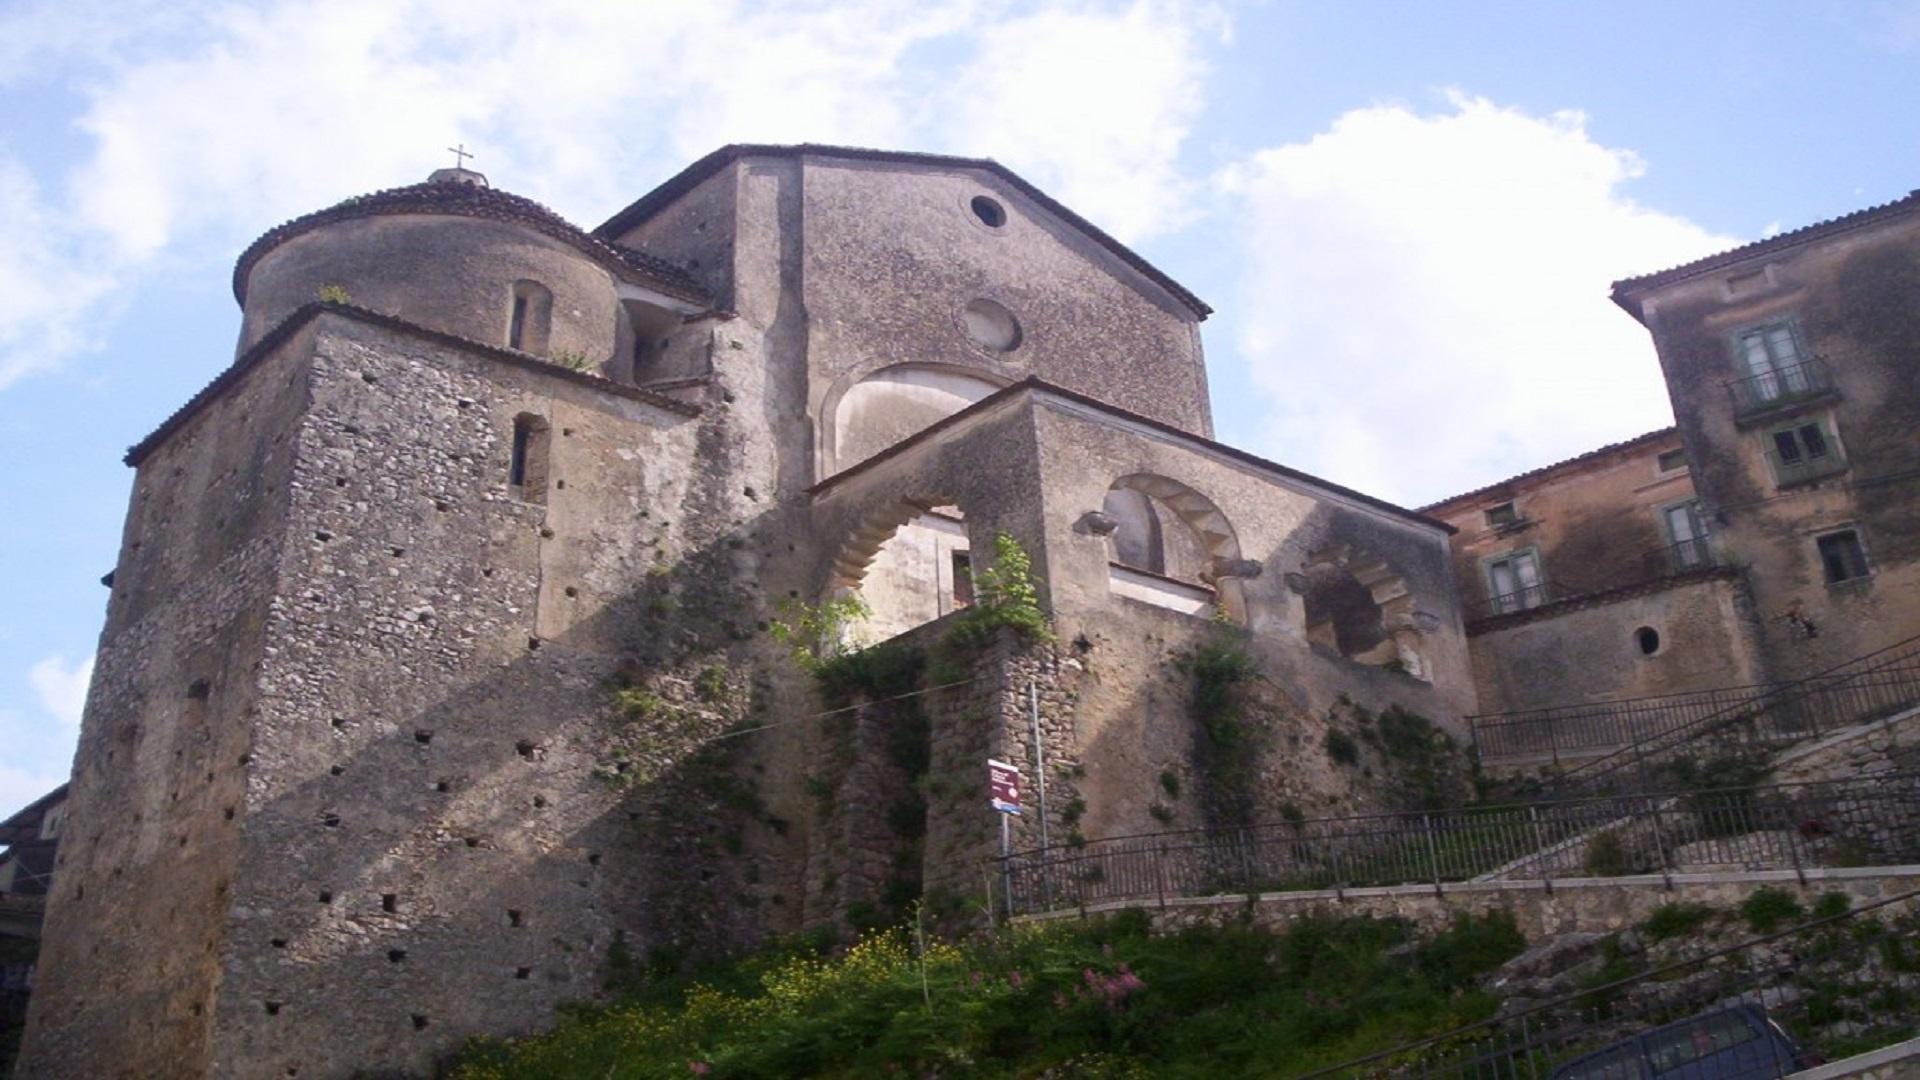 chiesa-assunta-felitto-esterno-1024x760